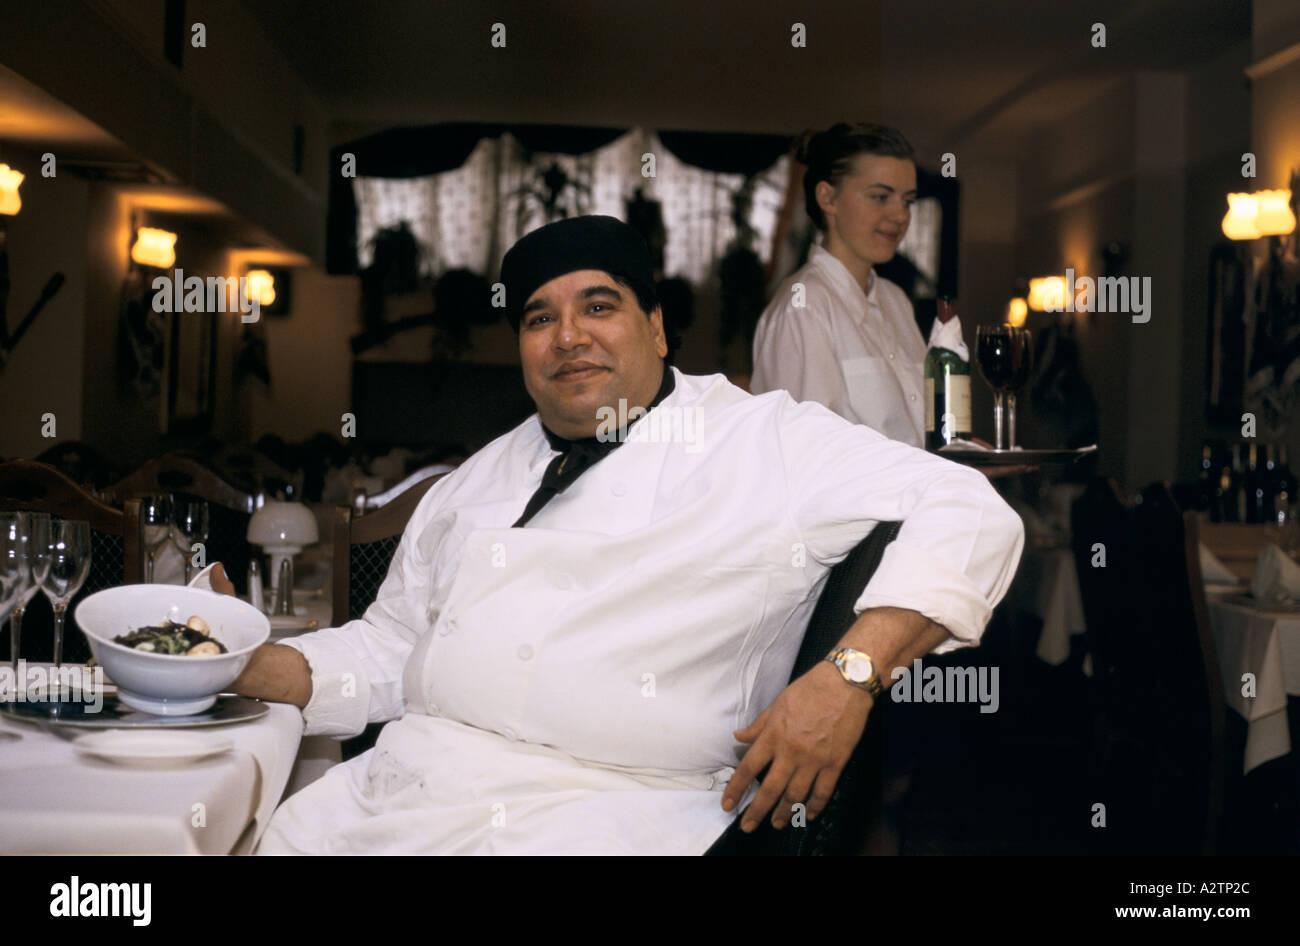 kuldeep makhni lancers chef owner june london 1997 1997 - Stock Image